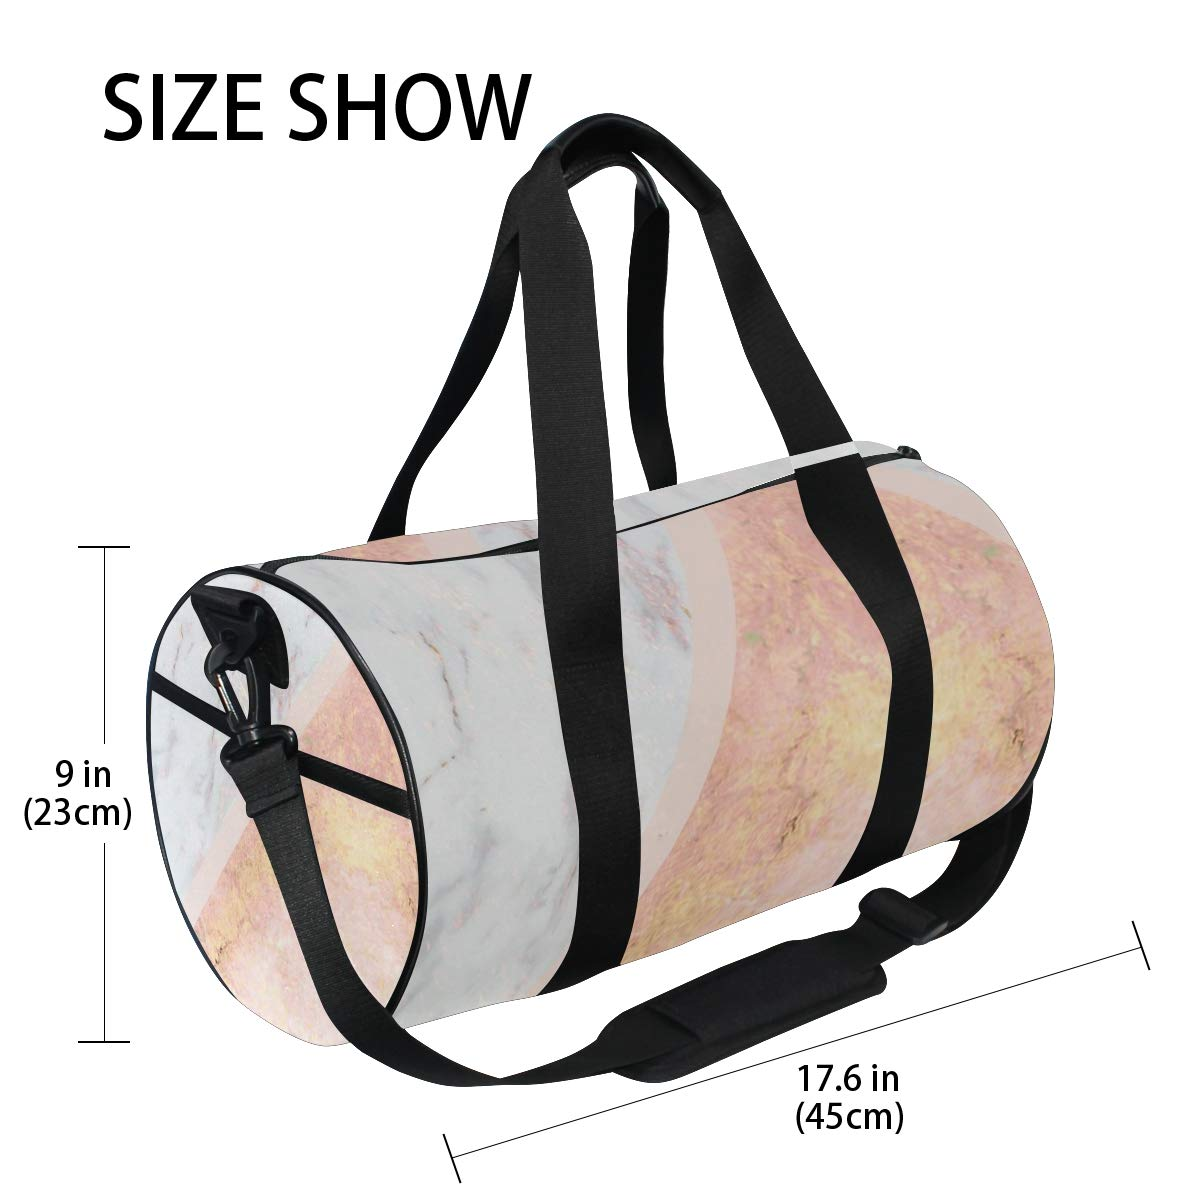 Marble Rose GoldPopular casual fitness bag sports bag suitable for men and women. non-slip wearable handbag crossbody bag